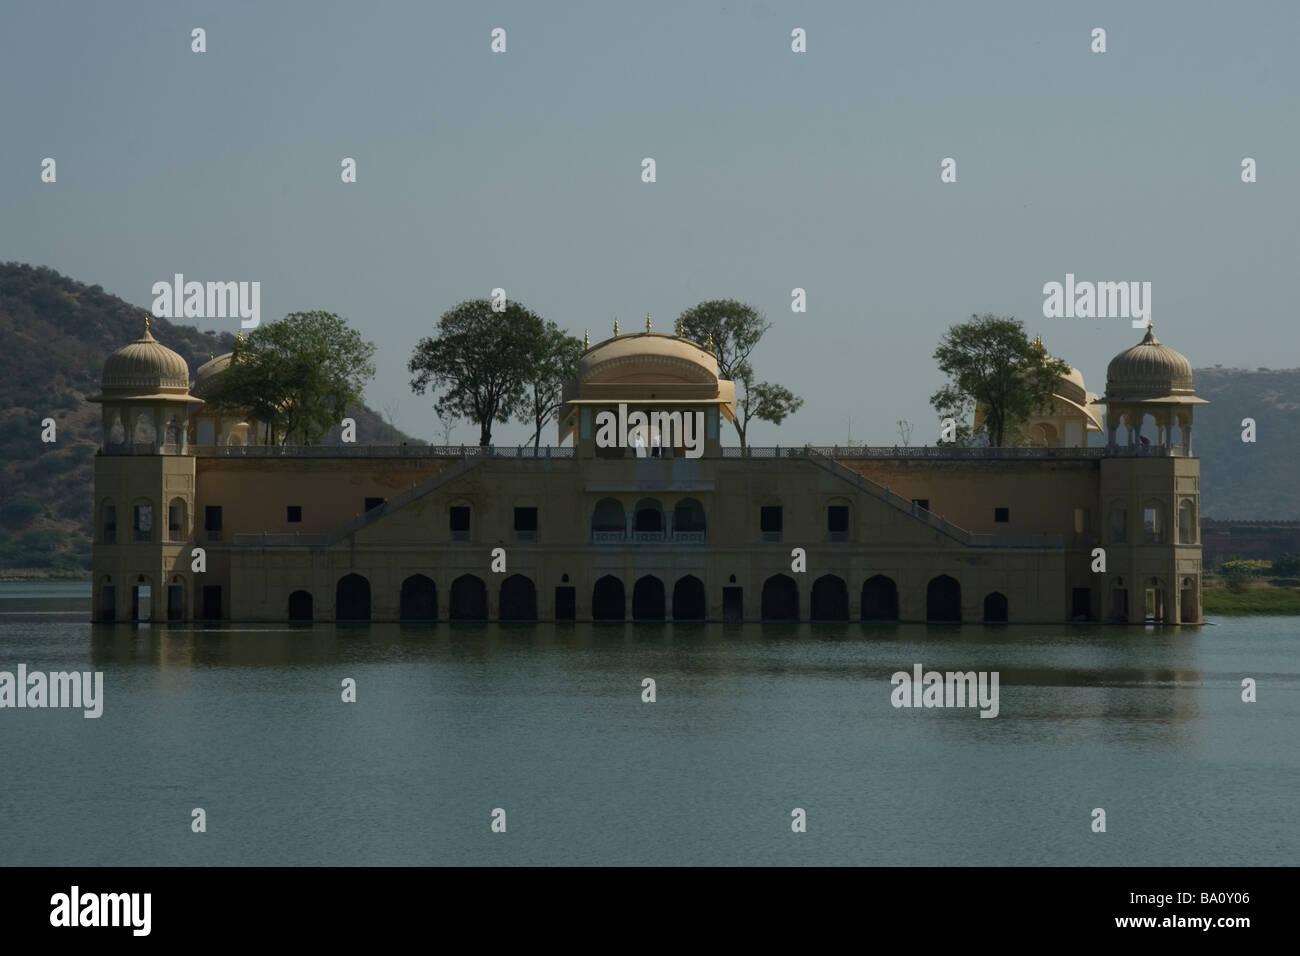 Jai Mahal, Water Palace, Jaipur - Stock Image